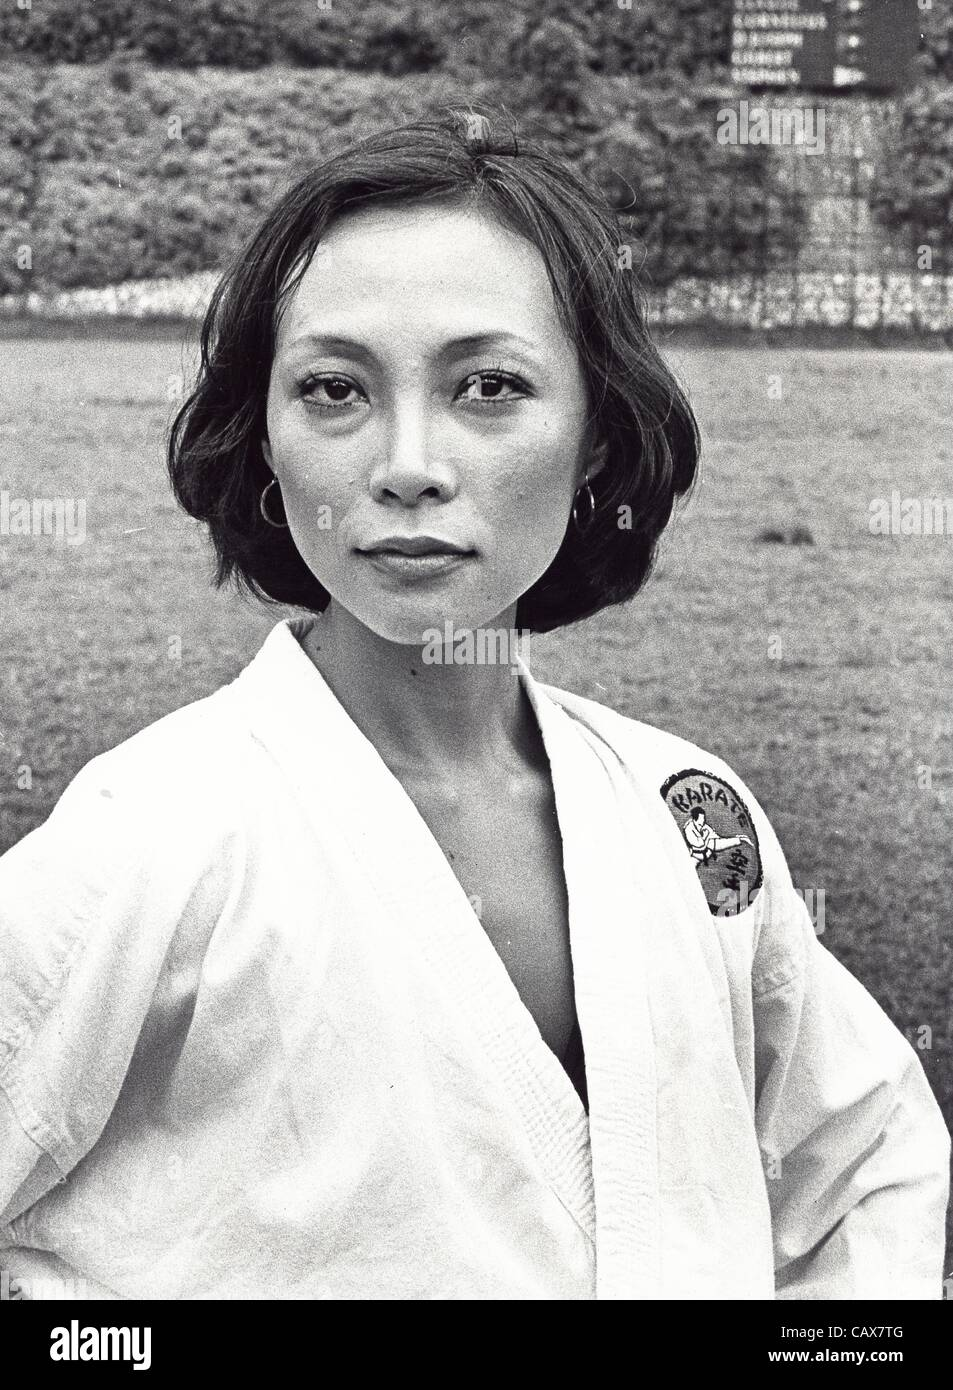 Forum on this topic: Phongchi (b. 1990 Vietnamese descent, mark-mcgann-born-1961/